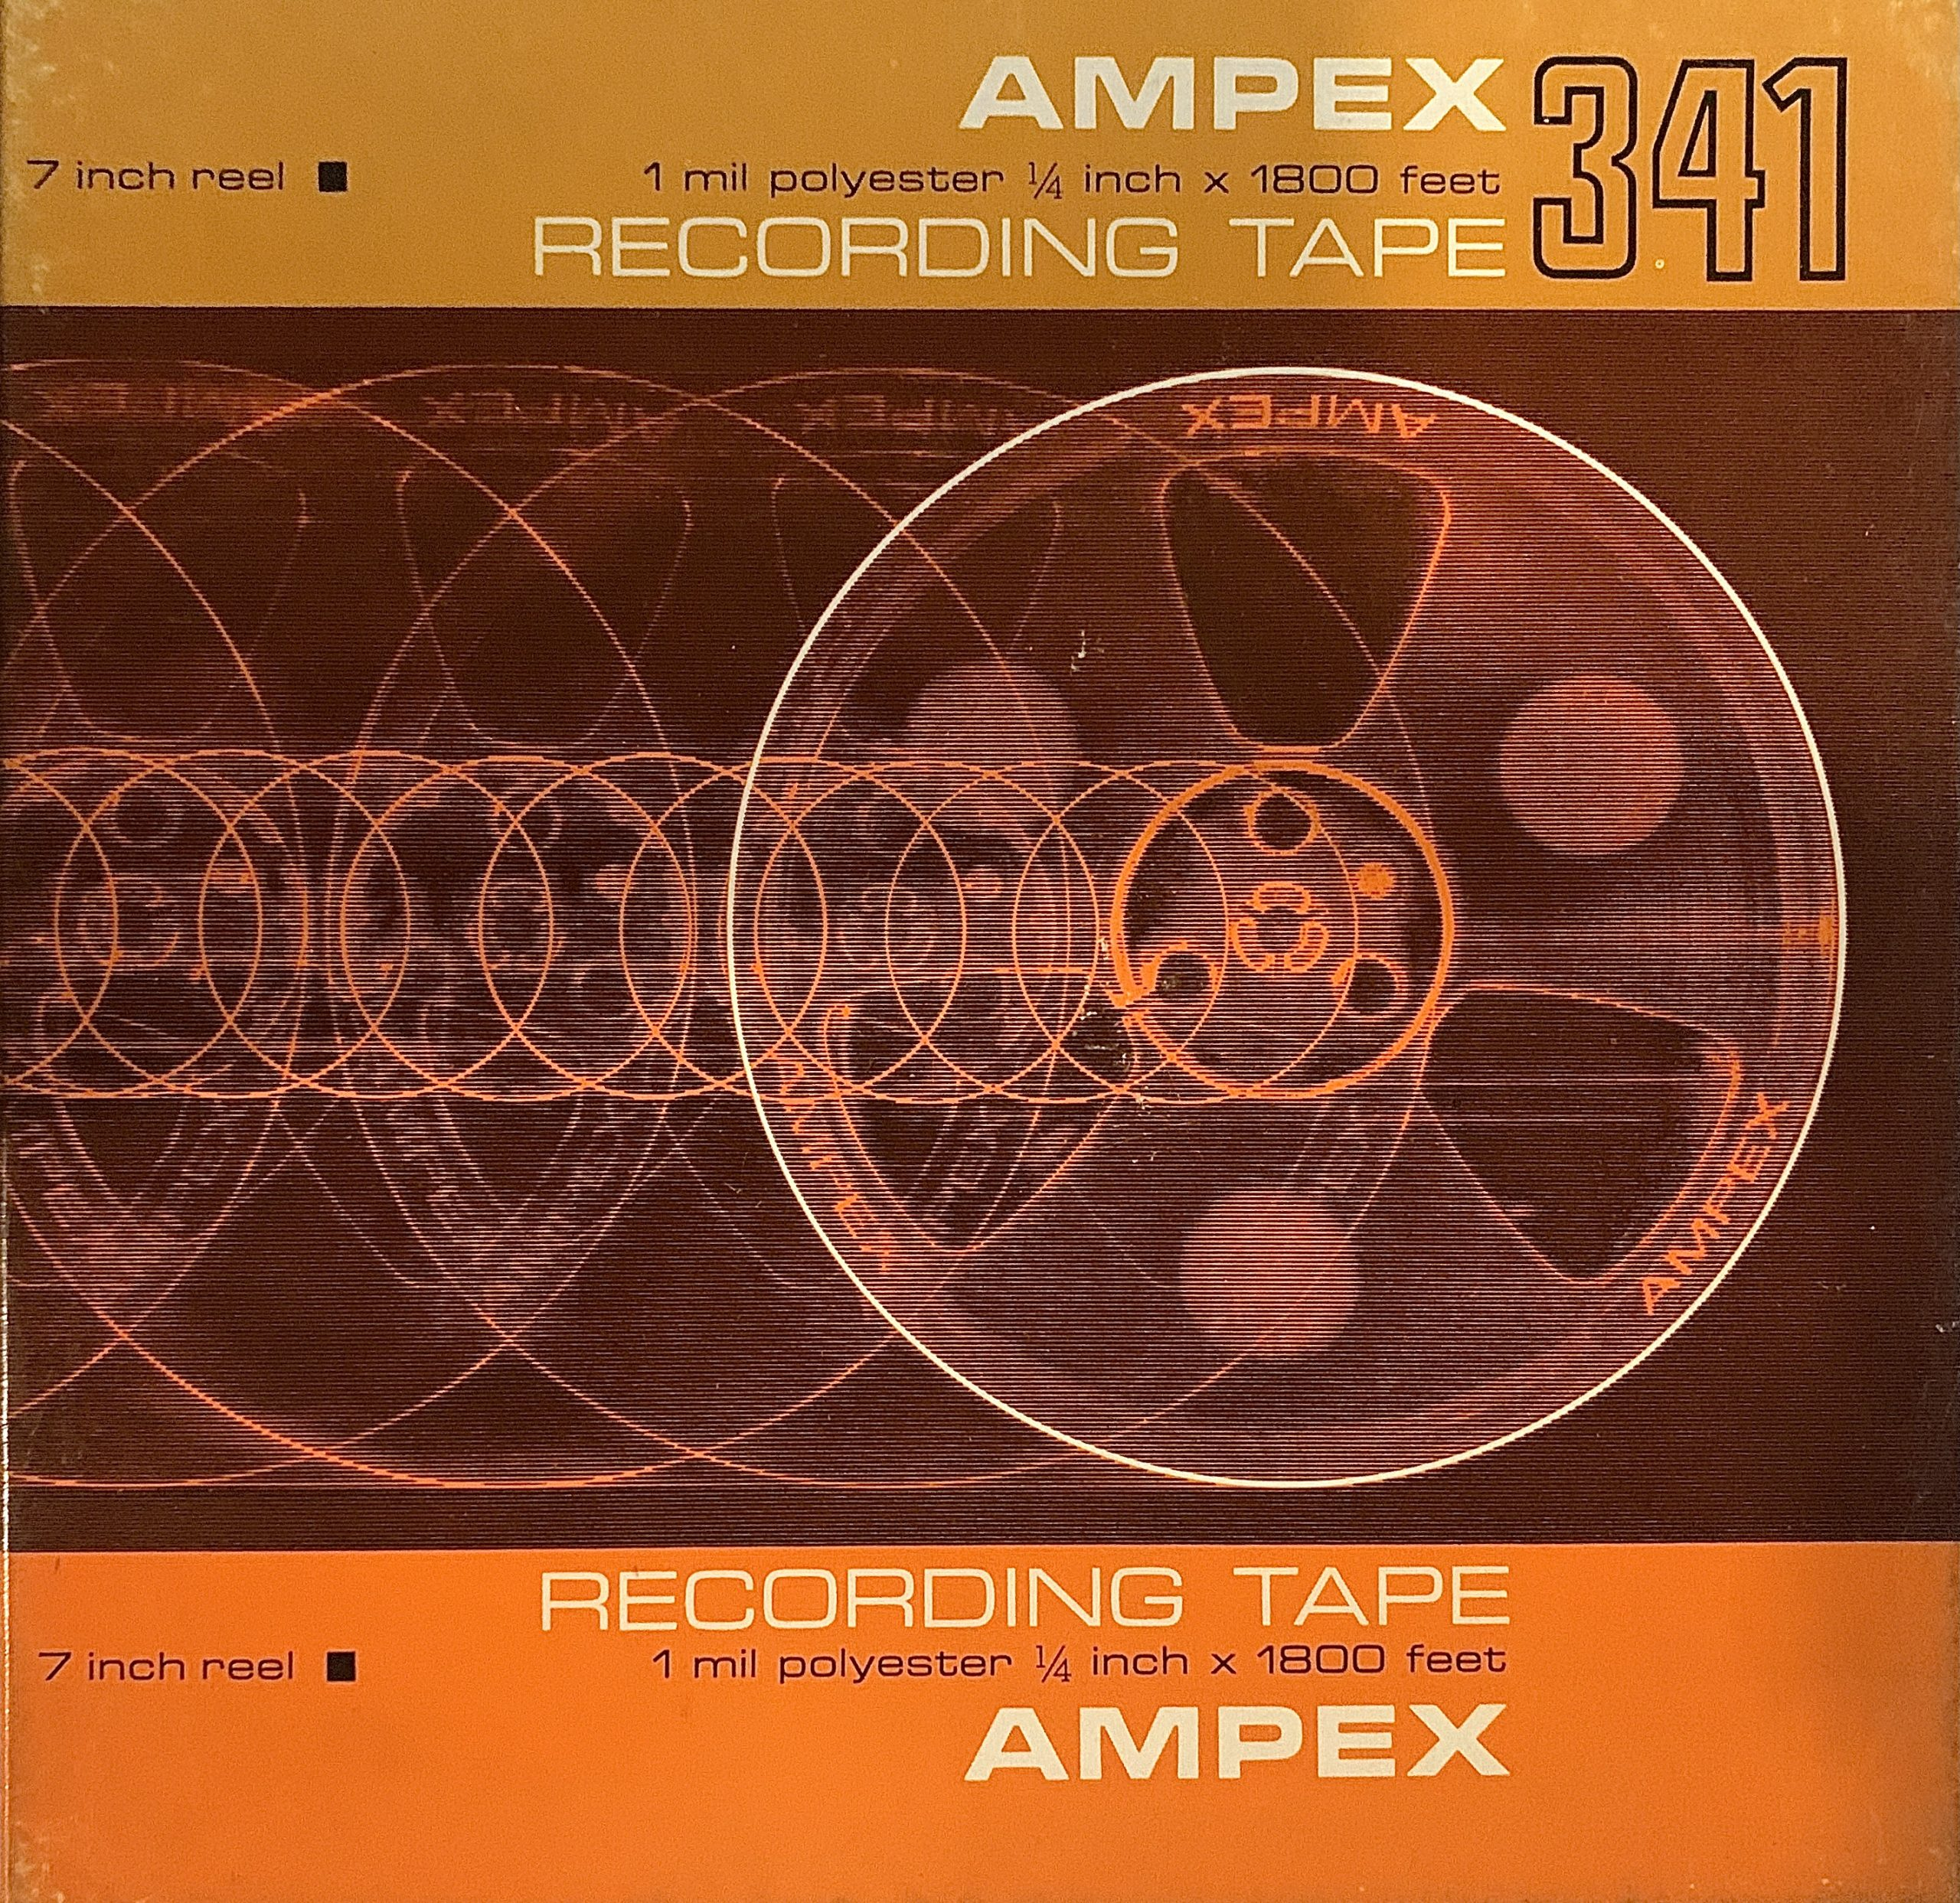 Ampex-341-Reel-Tape-Box-1960s